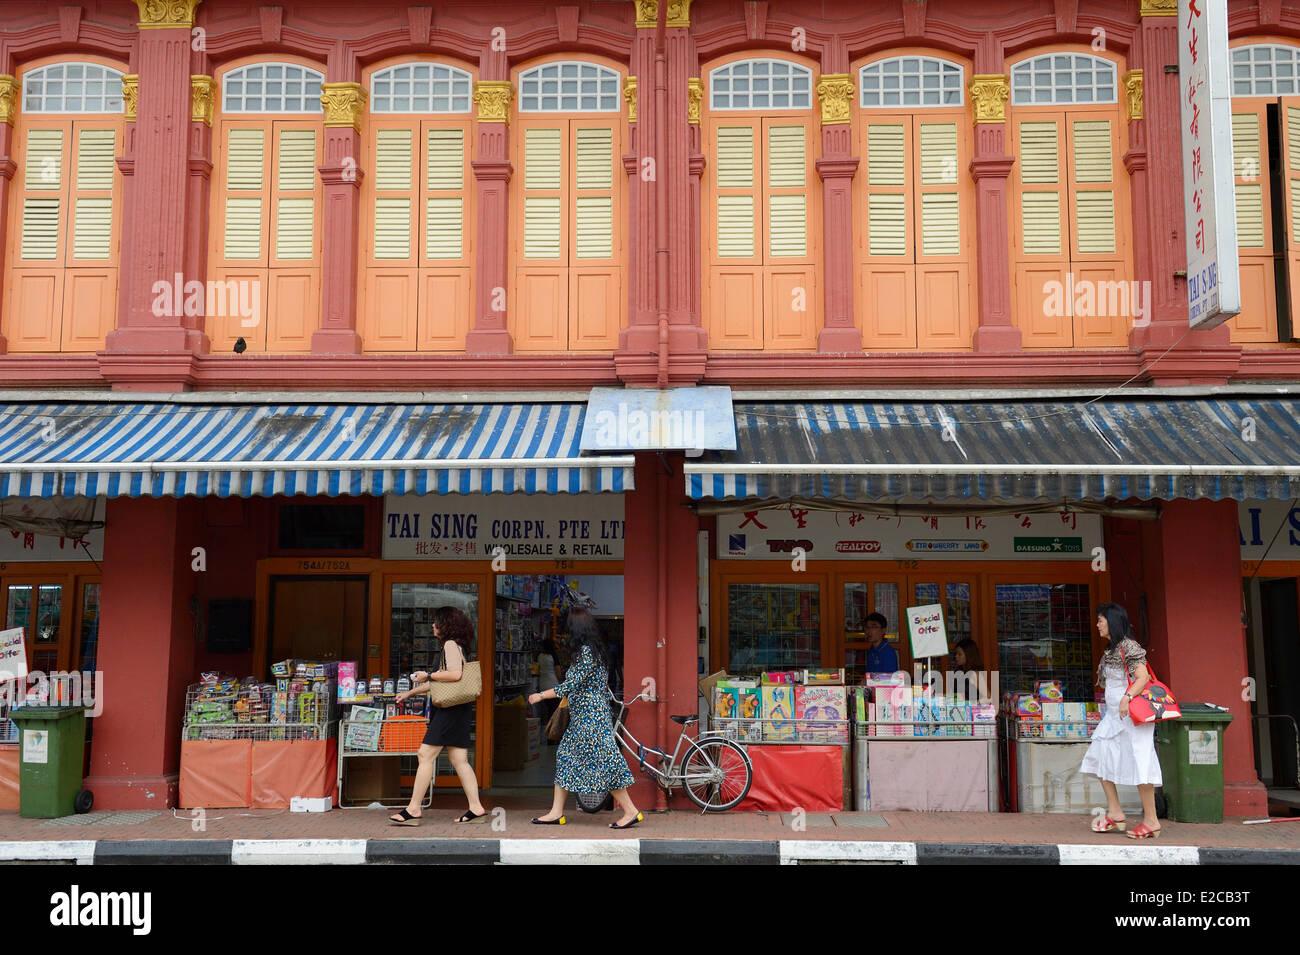 Singapore, Kampong Glam district - Stock Image